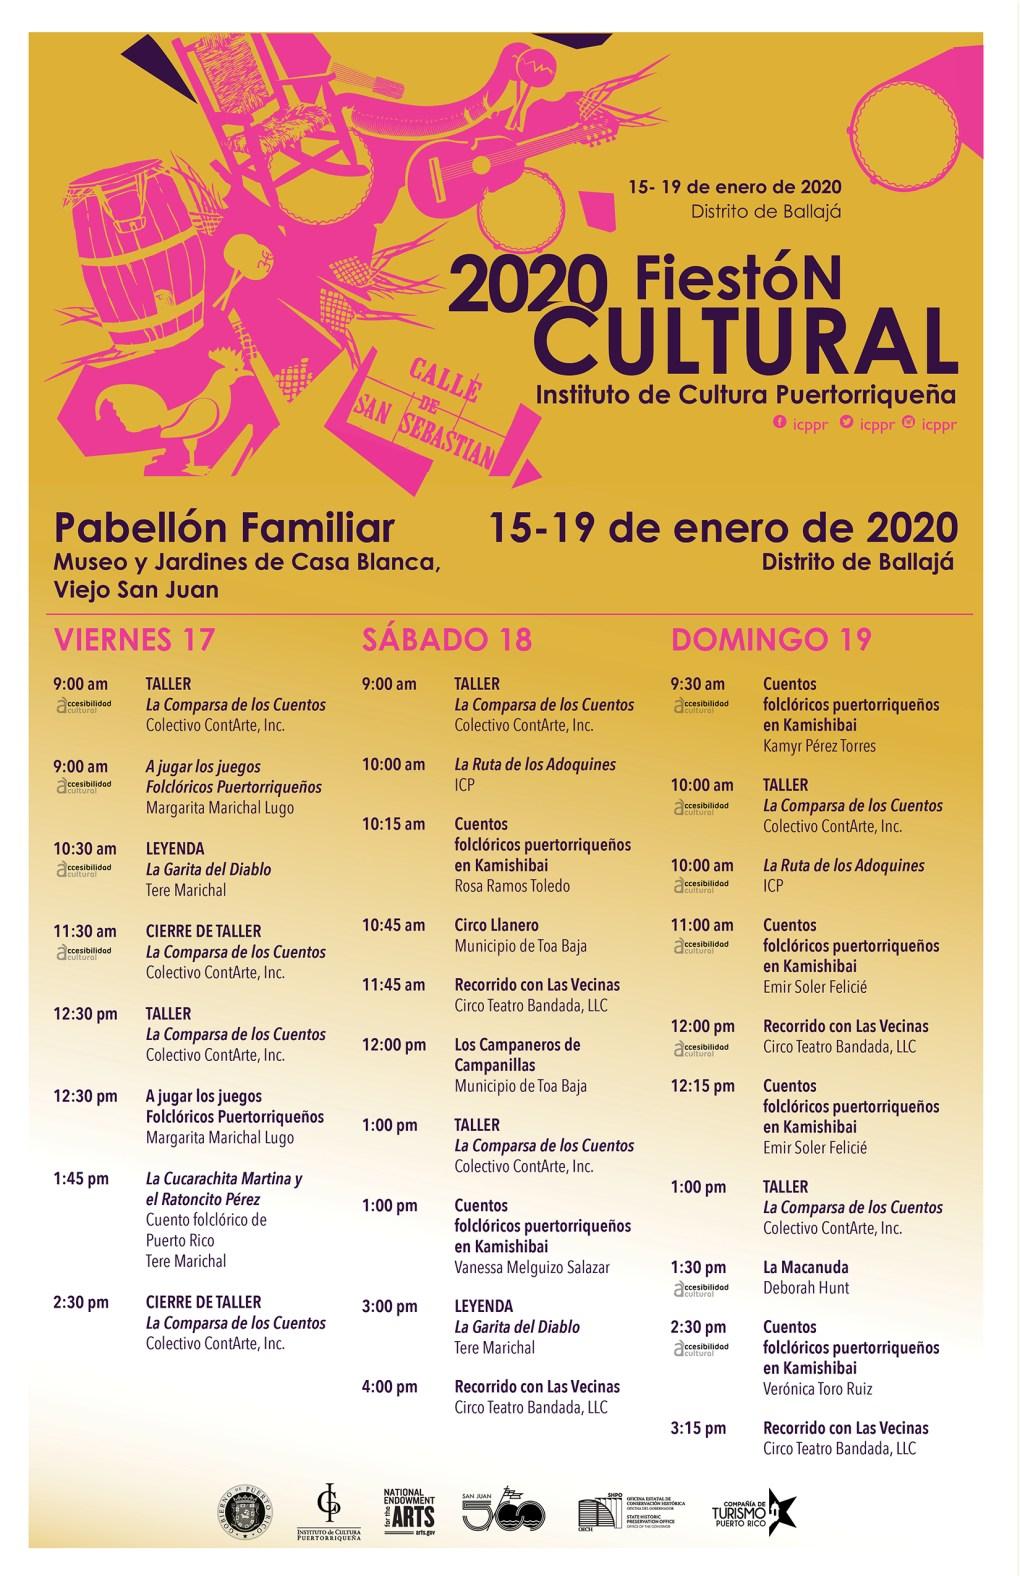 Fiestón Cultural 2020